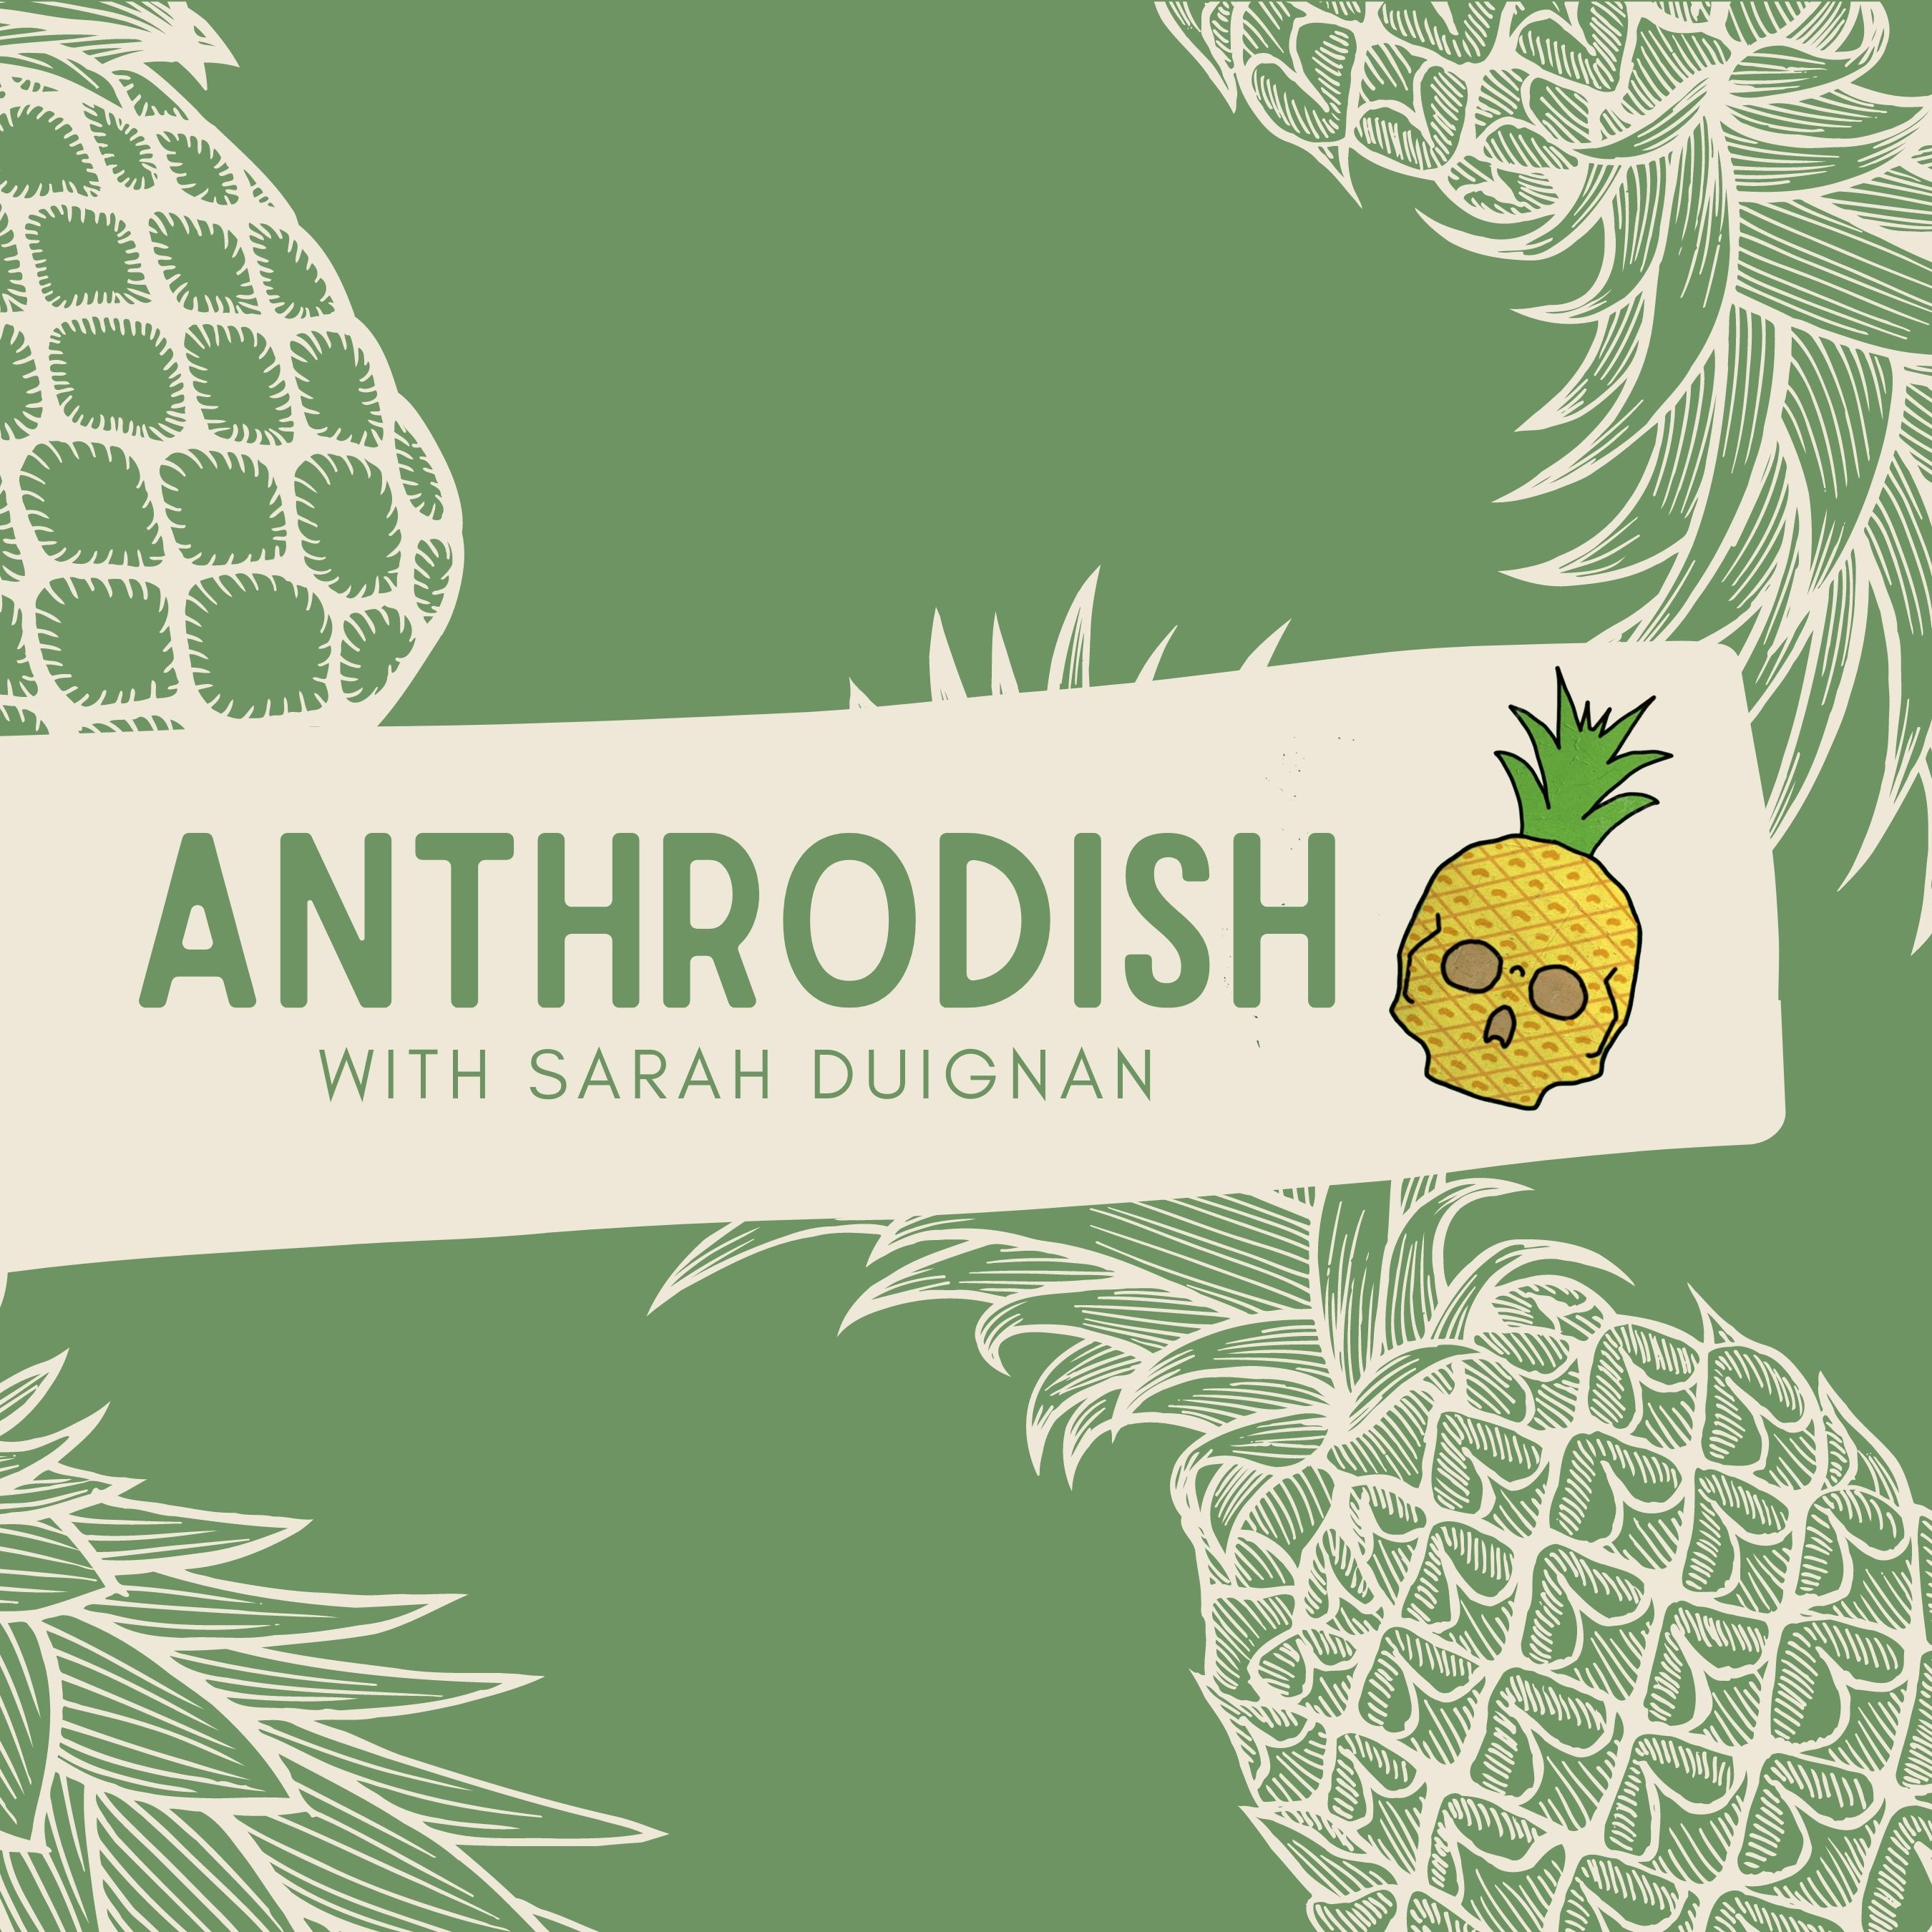 AnthroDish